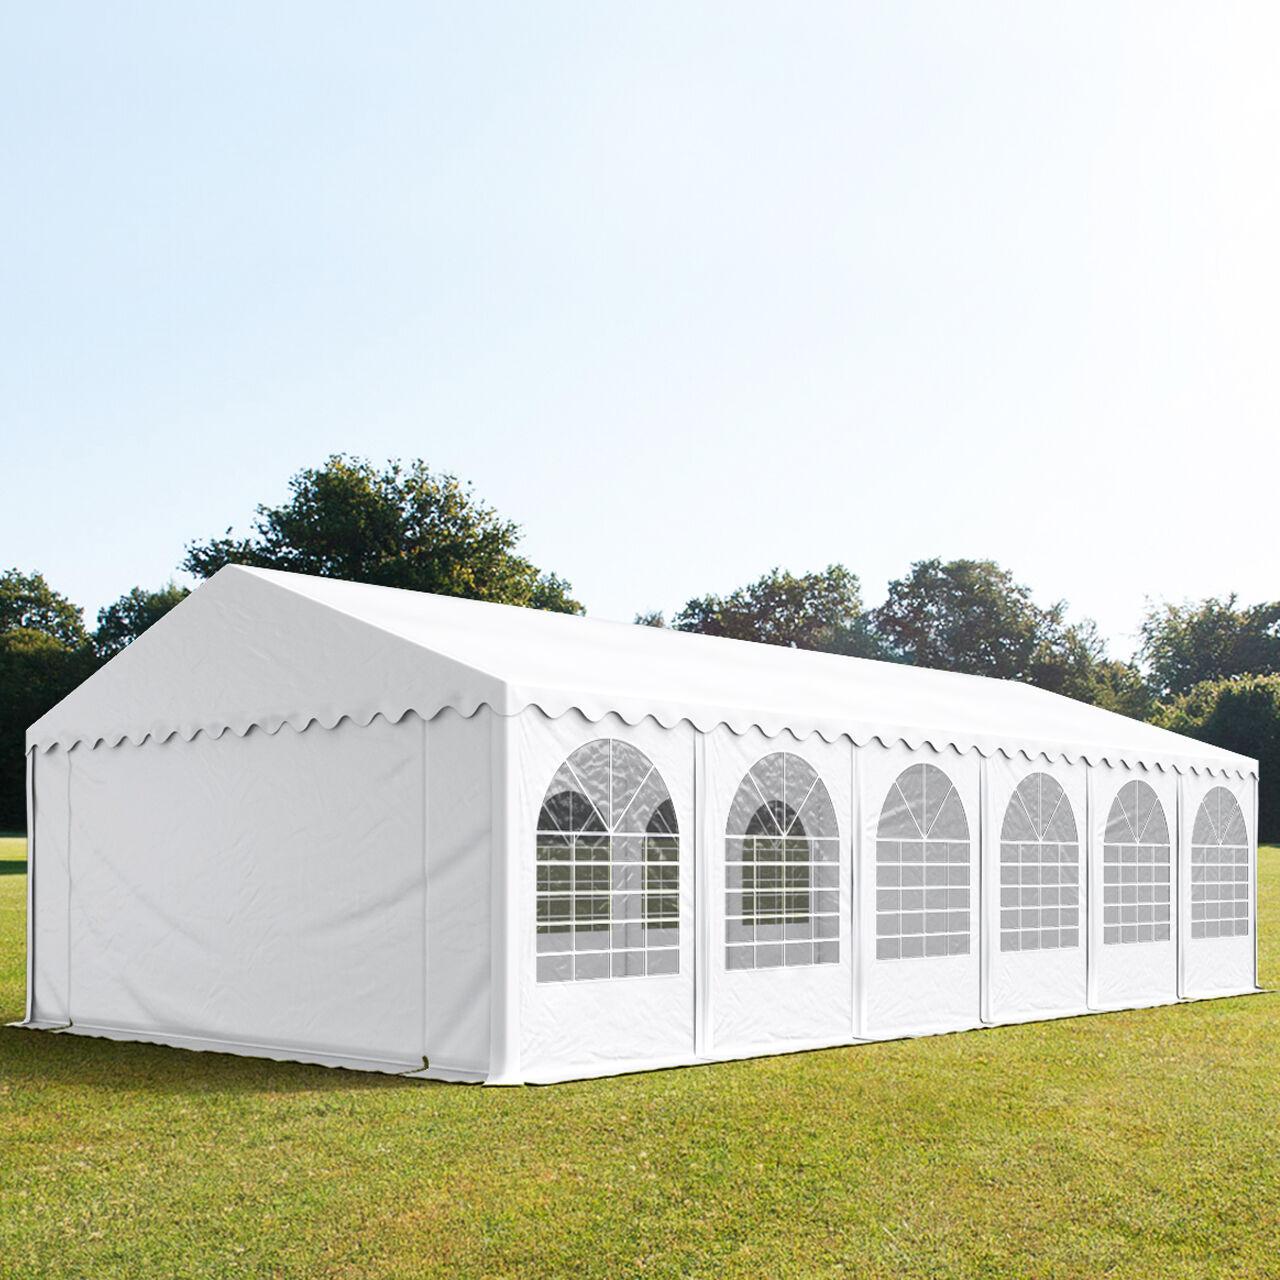 Toolport Tendone per Feste 6x12m PVC 550 g/m² bianco impermeabile